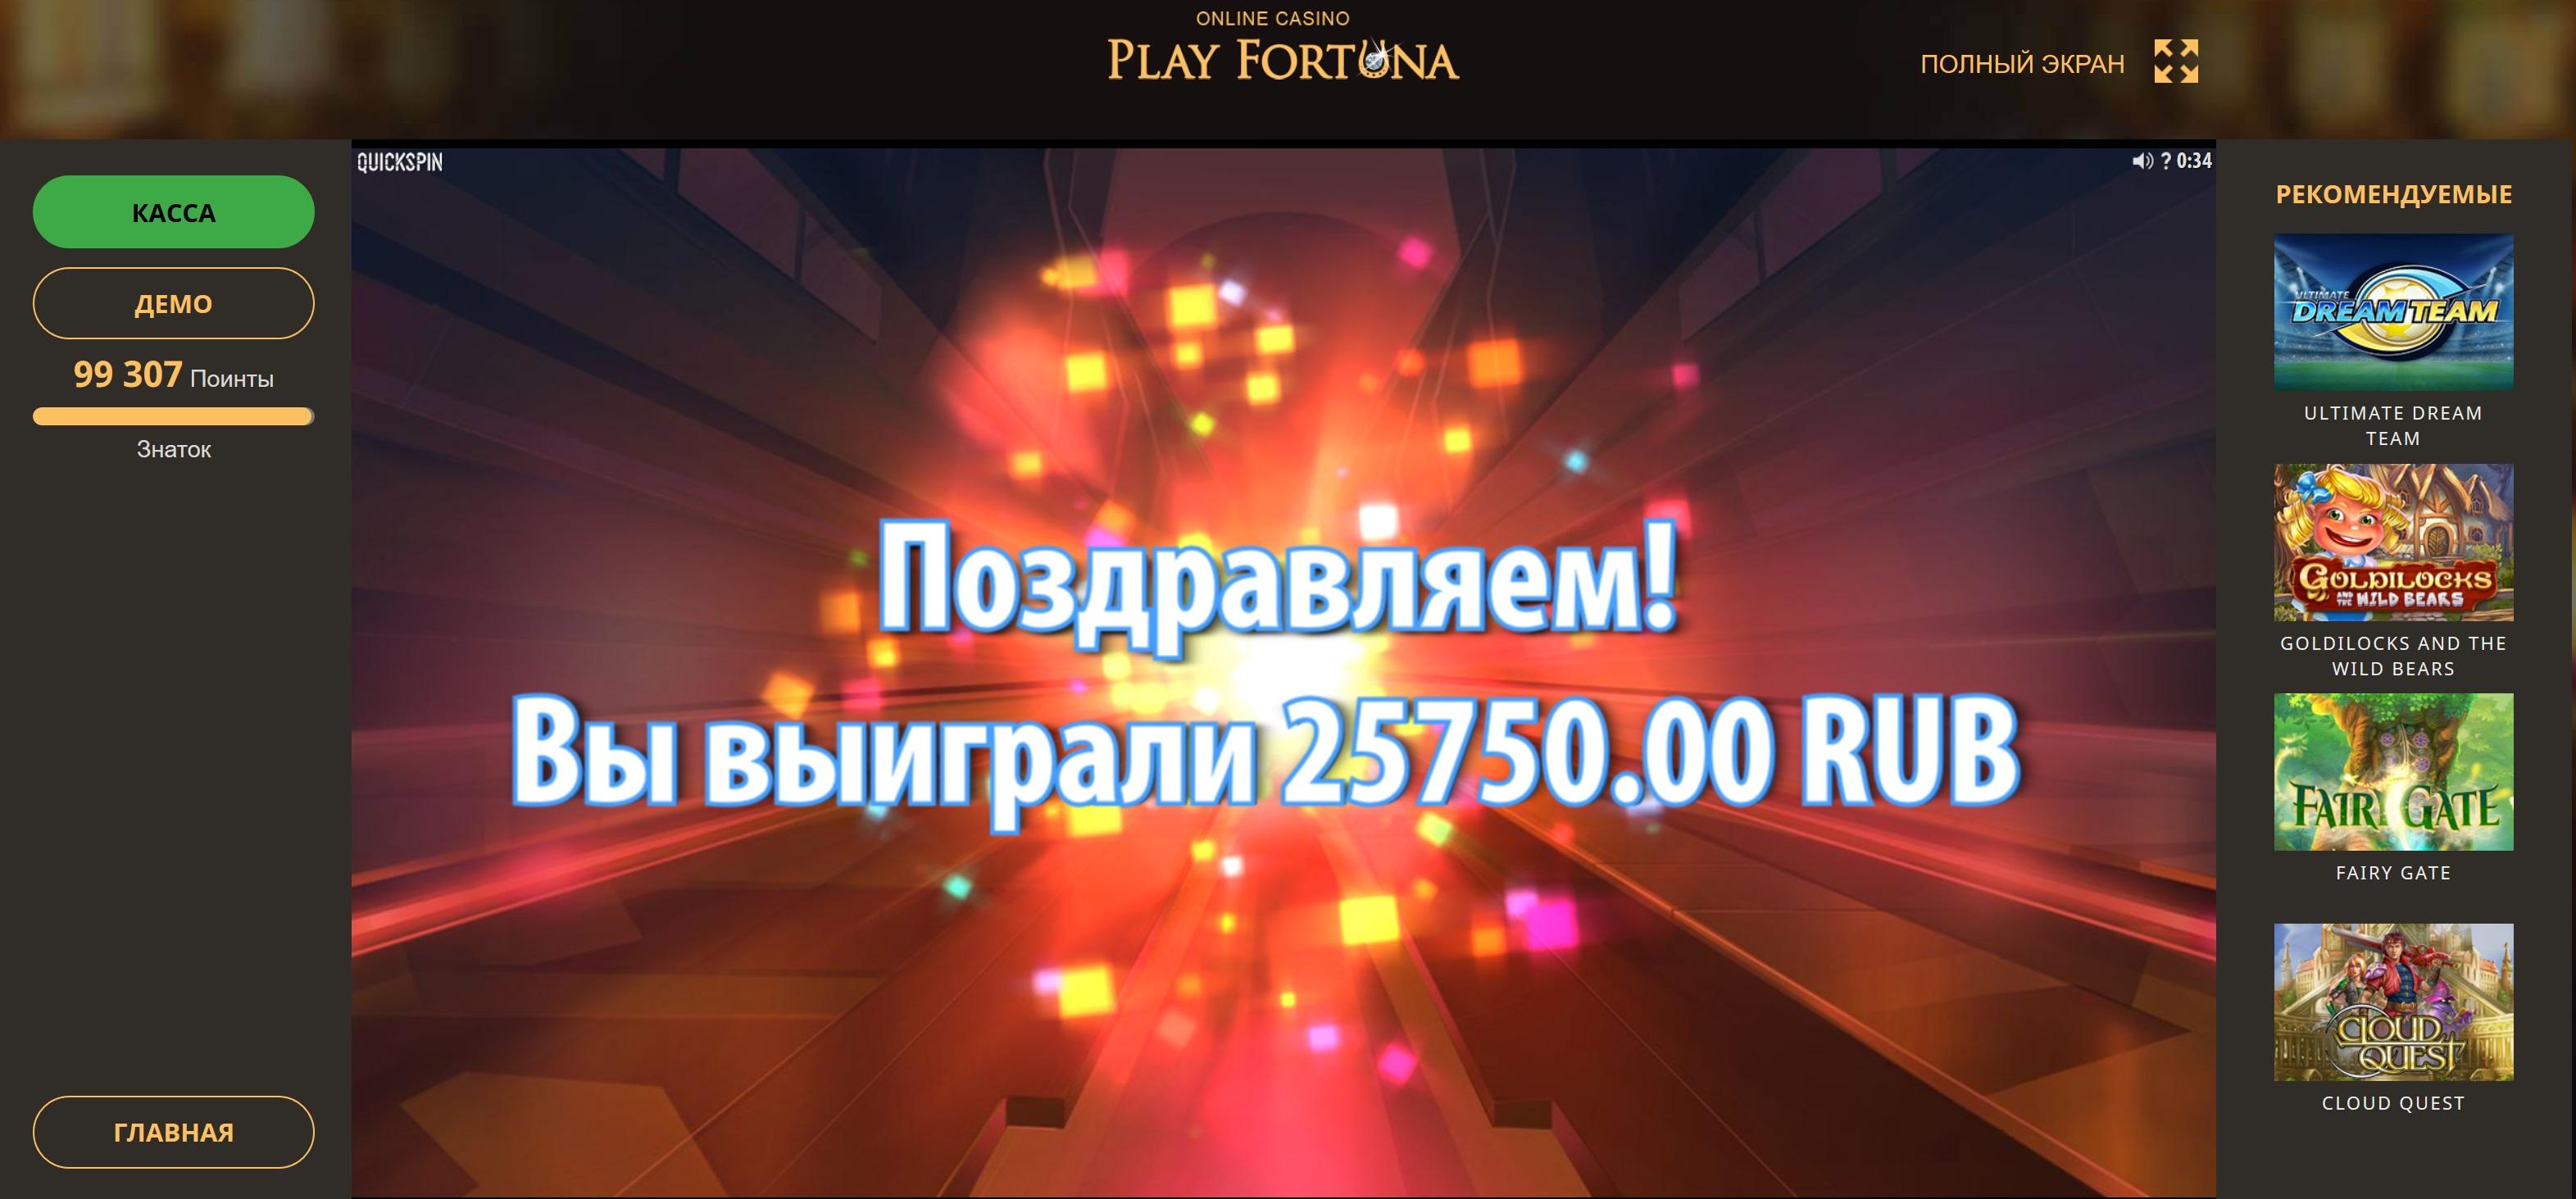 фортуна казино демо